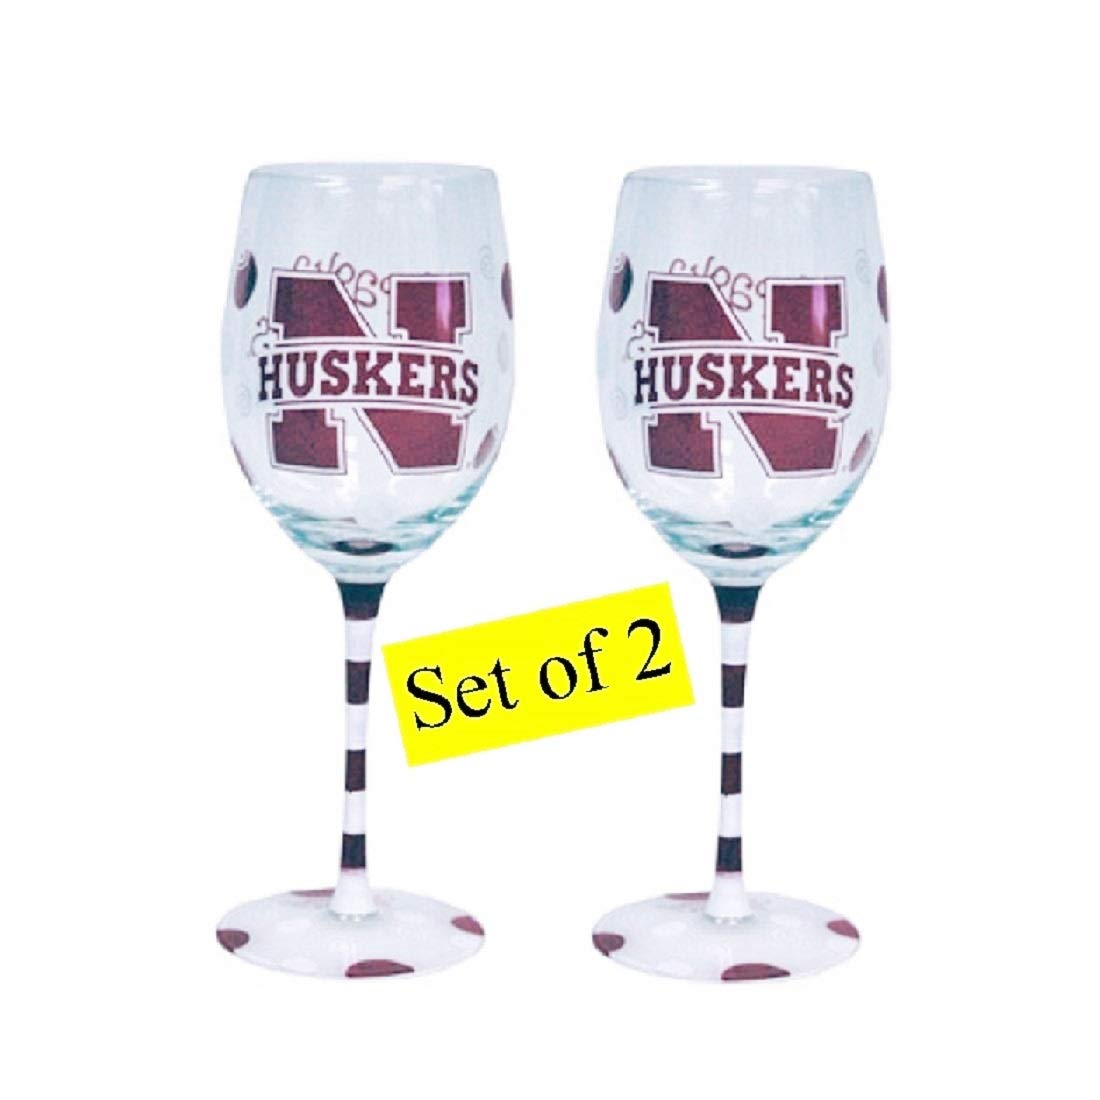 Nebraska Cornhuskers Hand Painted Wine Glasses - Set of 2 by Jenkins Enterprises